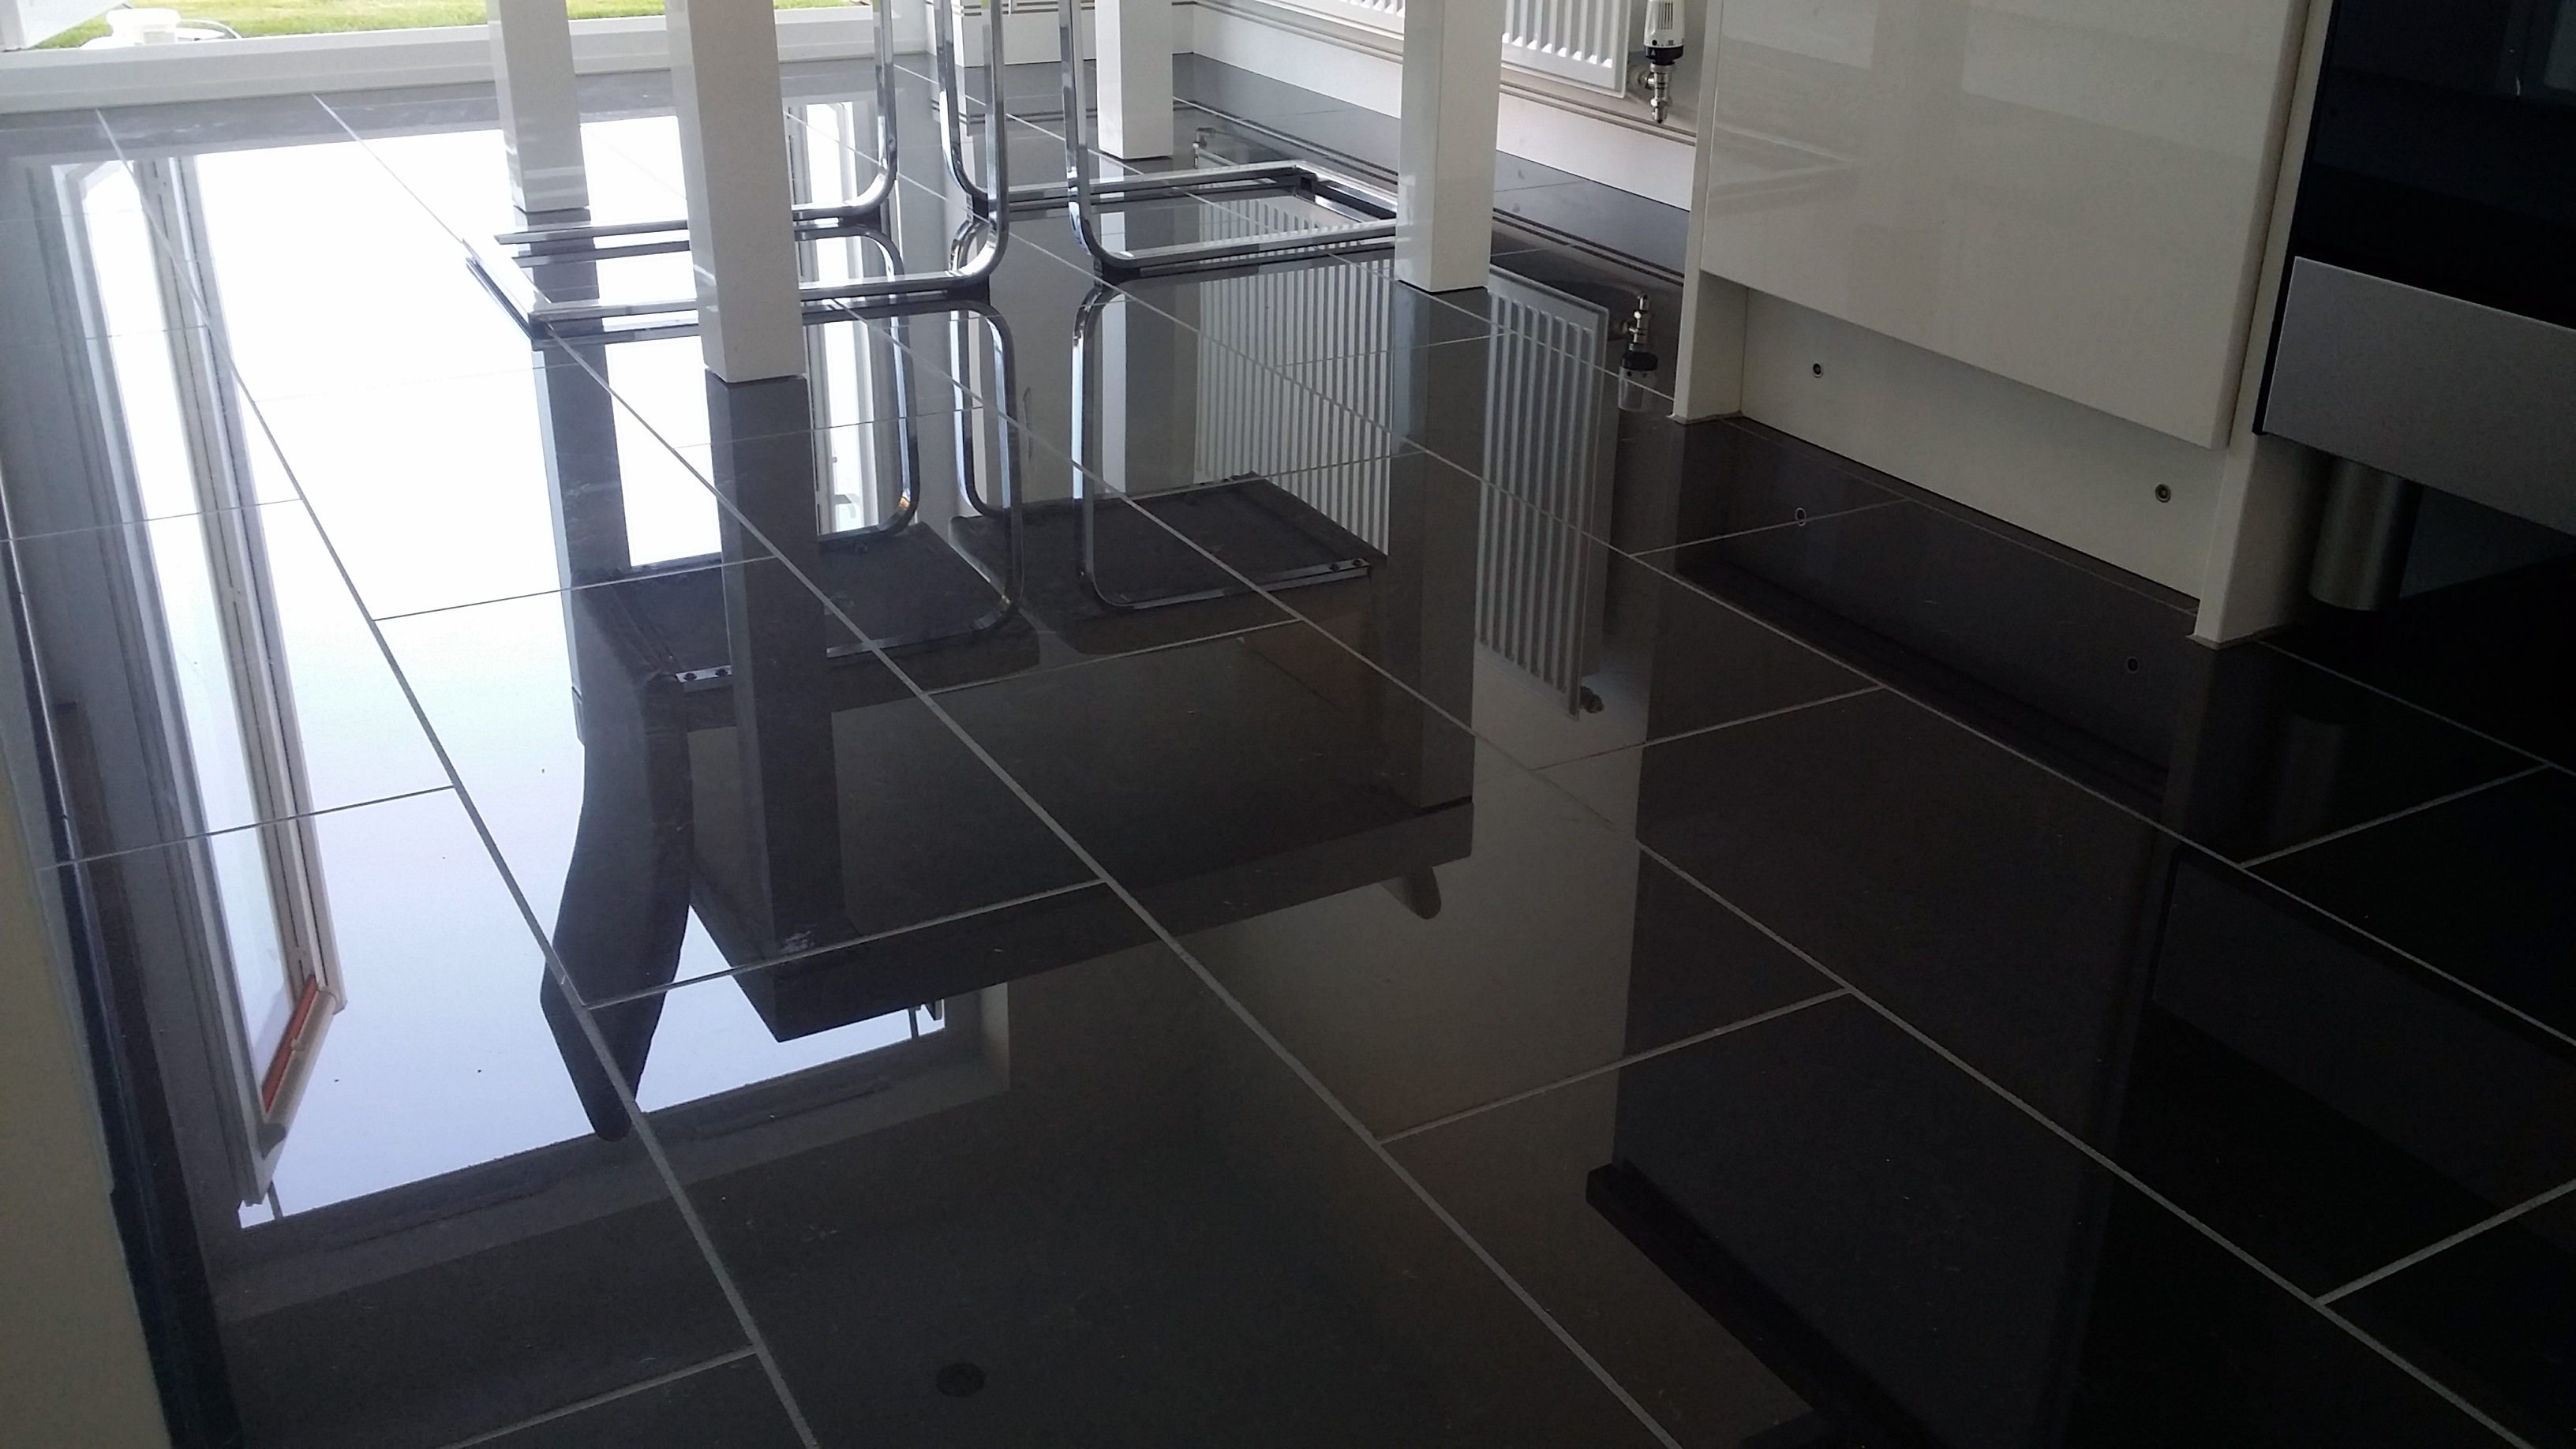 Black shiny floor tiles gallery home flooring design grey shiny floor tiles gallery home flooring design glossy floor tiles image collections tile flooring design doublecrazyfo Images